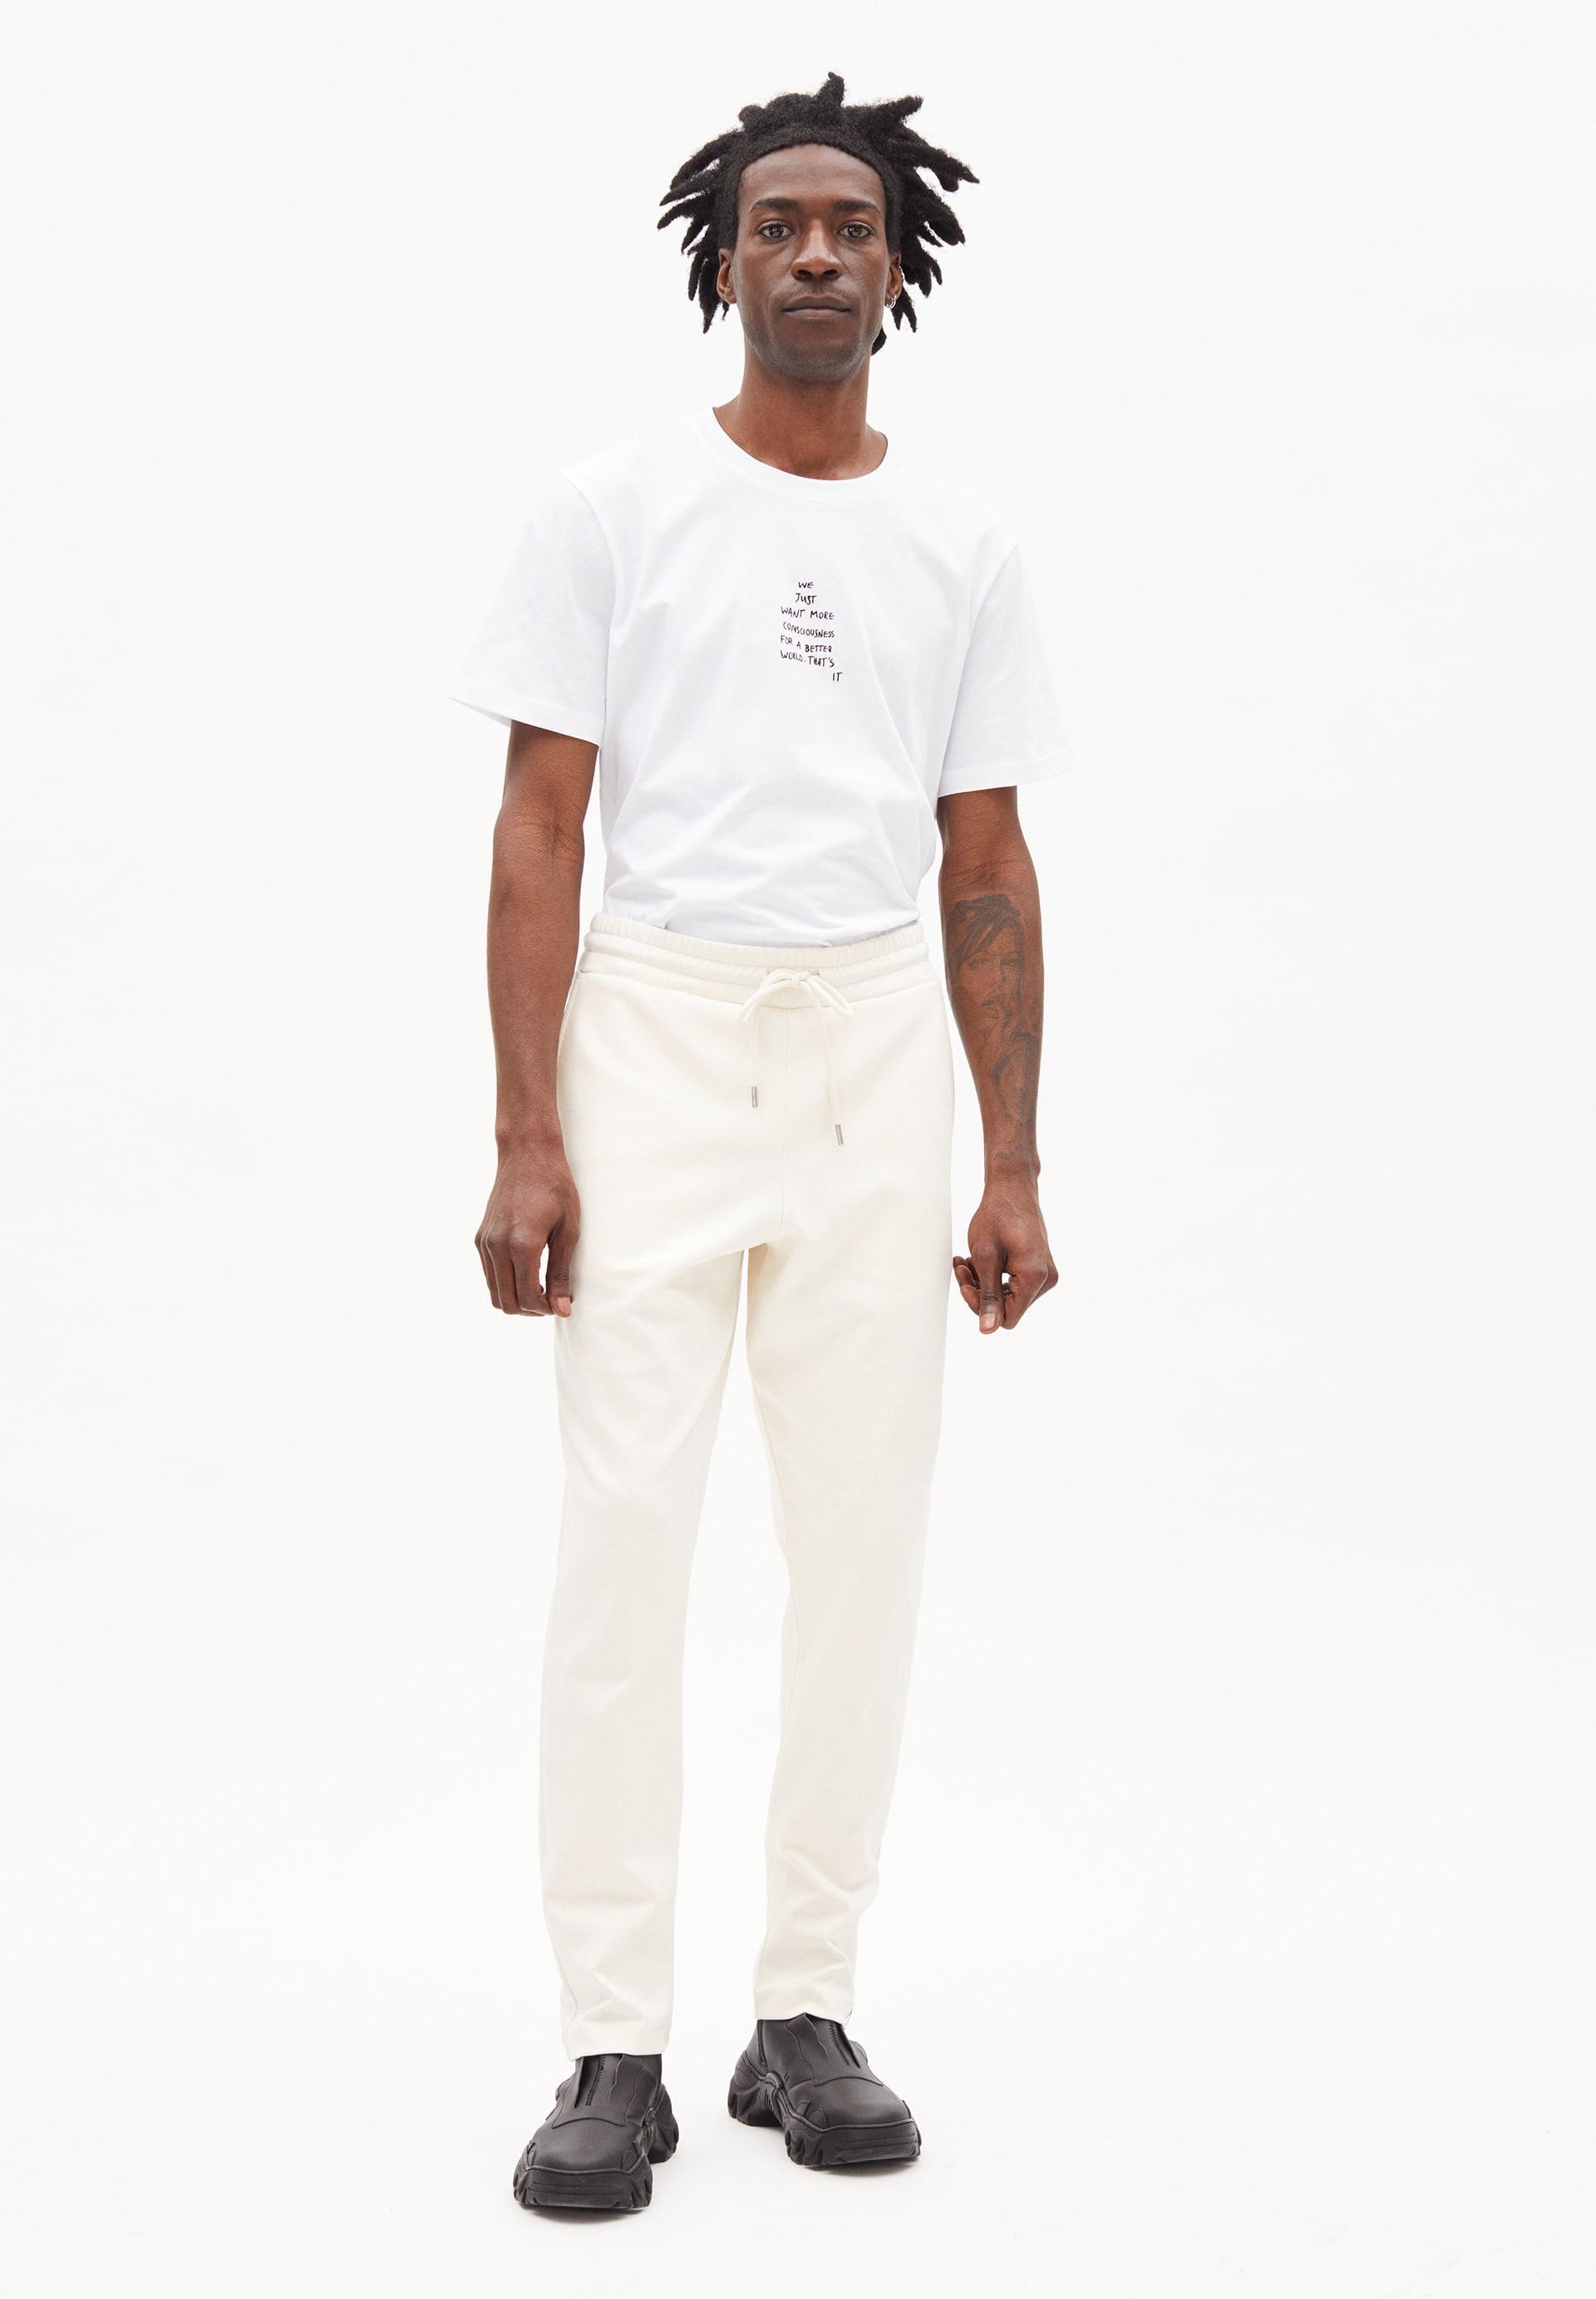 LUCAAI UNDYED Sweat Pants made of Organic Cotton